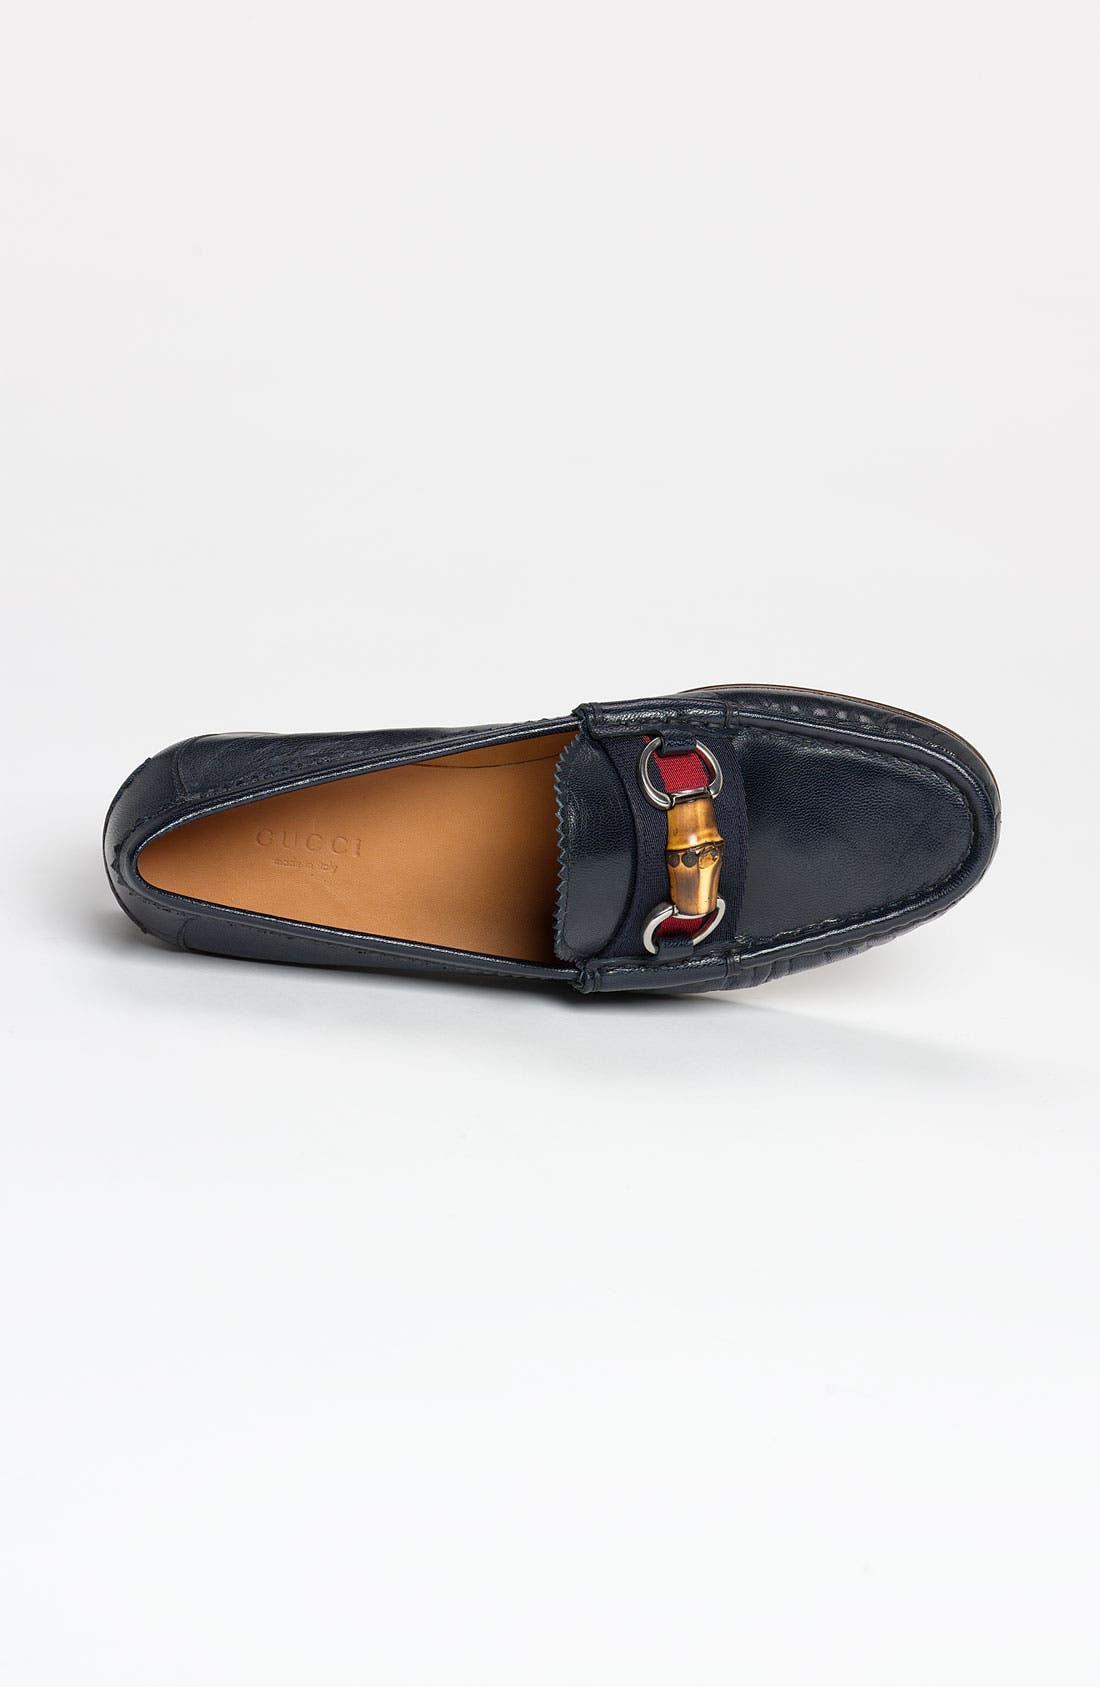 Alternate Image 3  - Gucci 'Clyde' Loafer